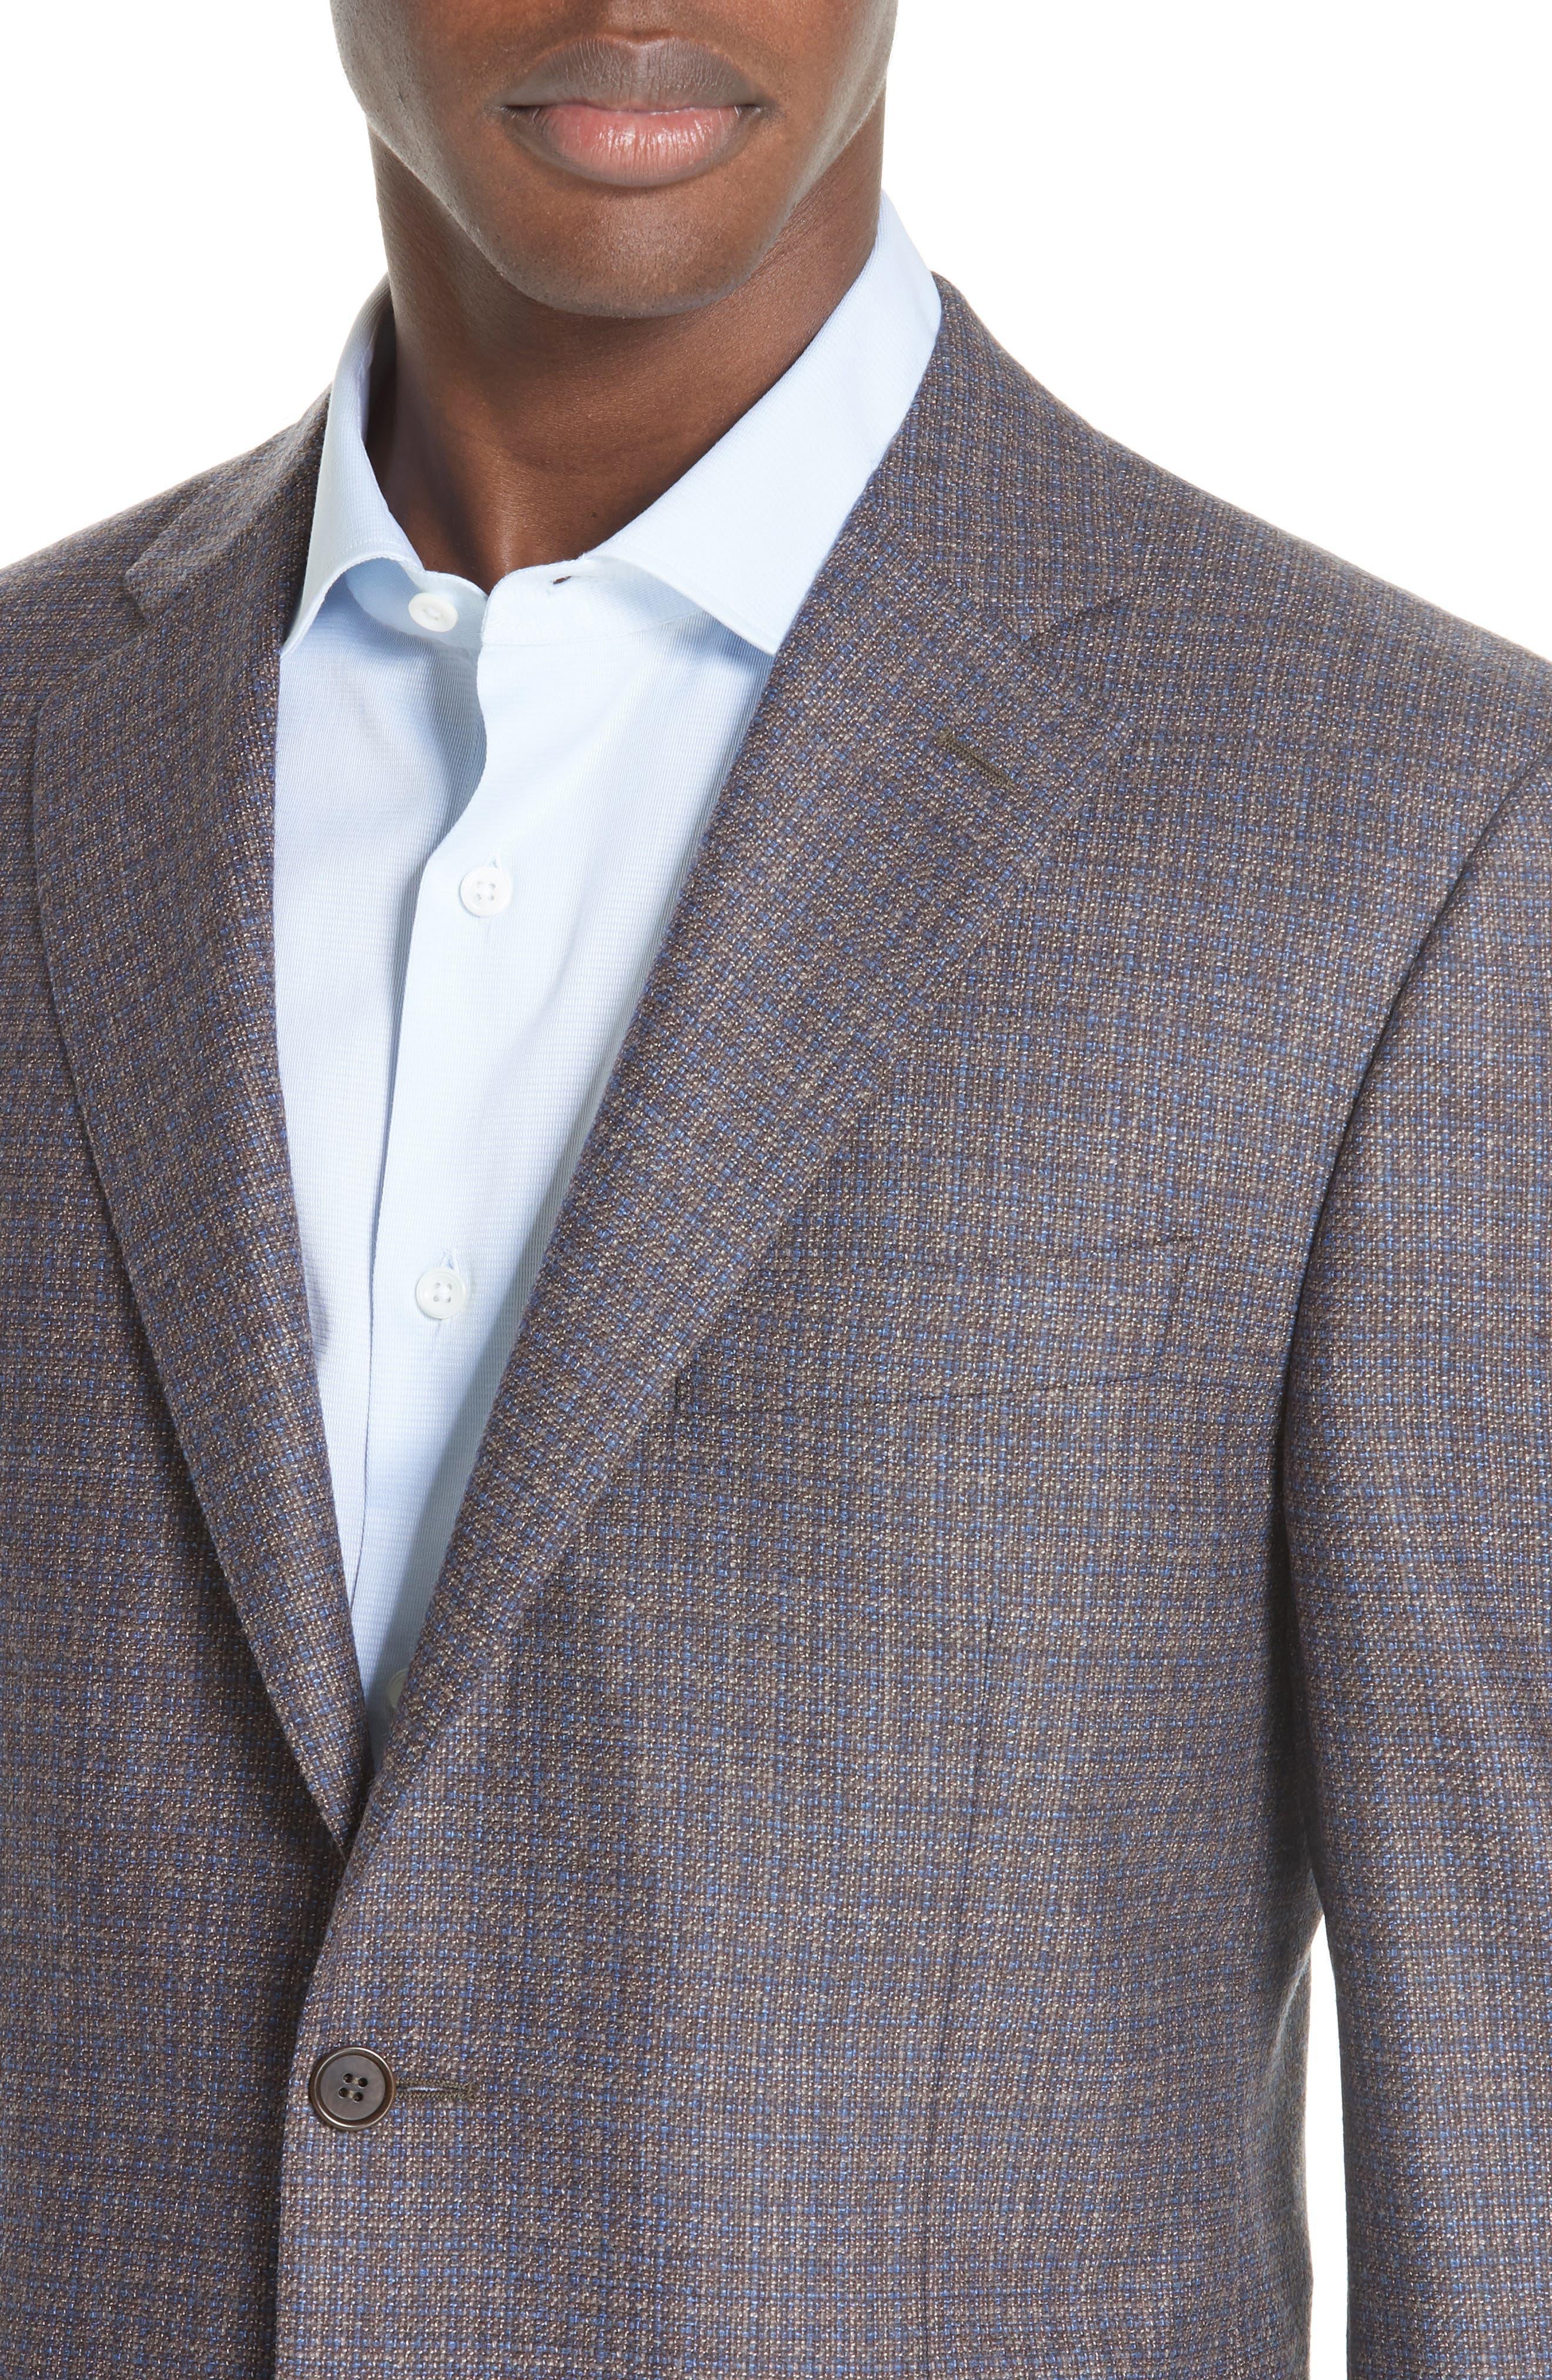 Classic Fit Check Wool & Cashmere Sport Coat,                             Alternate thumbnail 4, color,                             BROWN/ BLUE